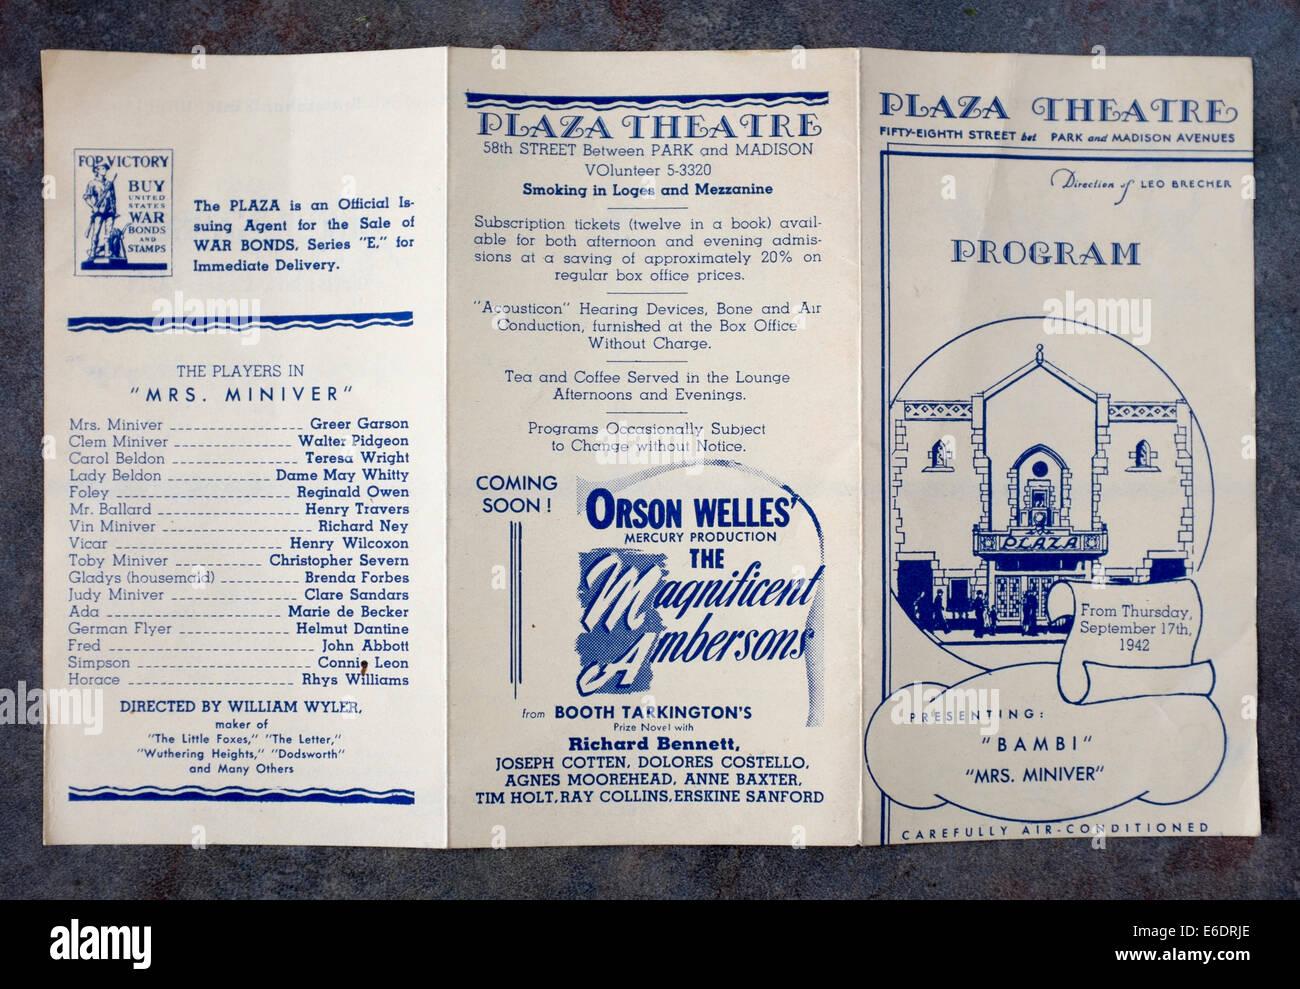 Theatre Program Stock Photos Images Alamy 1940s Old Fuse Box Vintage New York City Plaza Cinema Image